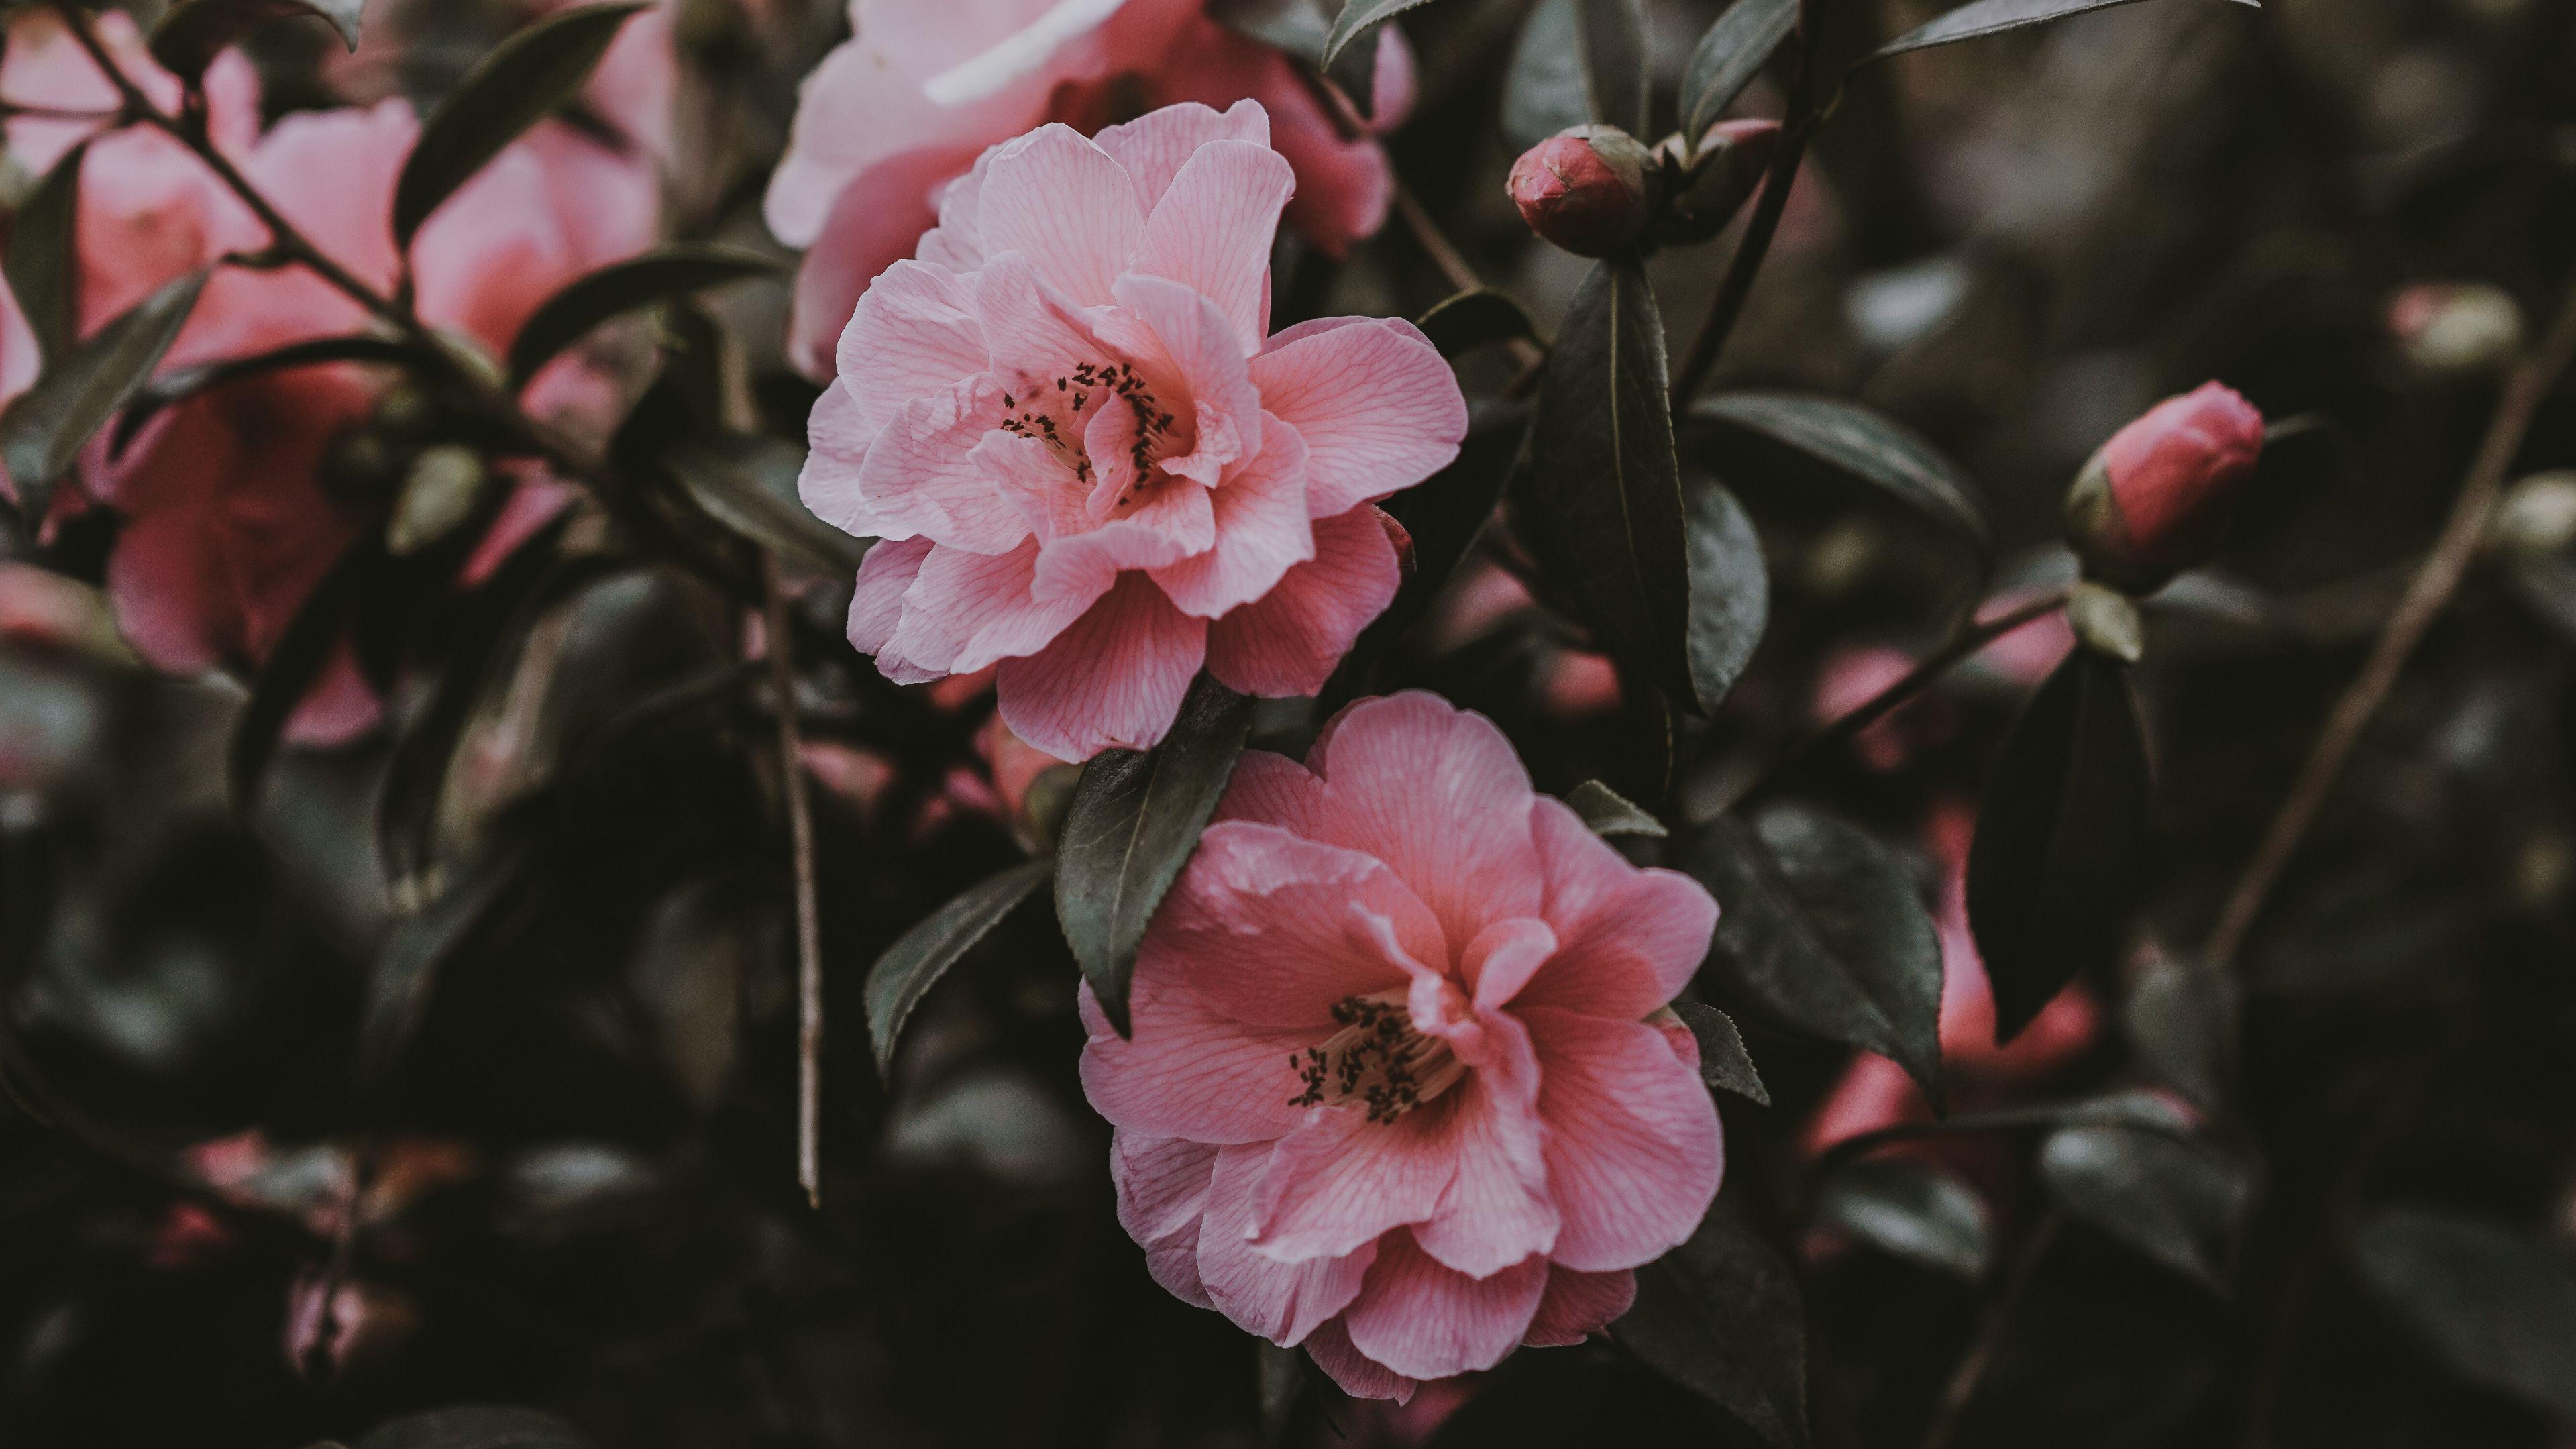 Pink Flowers Aesthetic Laptop Wallpapers Top Free Pink Flowers Aesthetic Laptop Backgrounds Wallpaperaccess